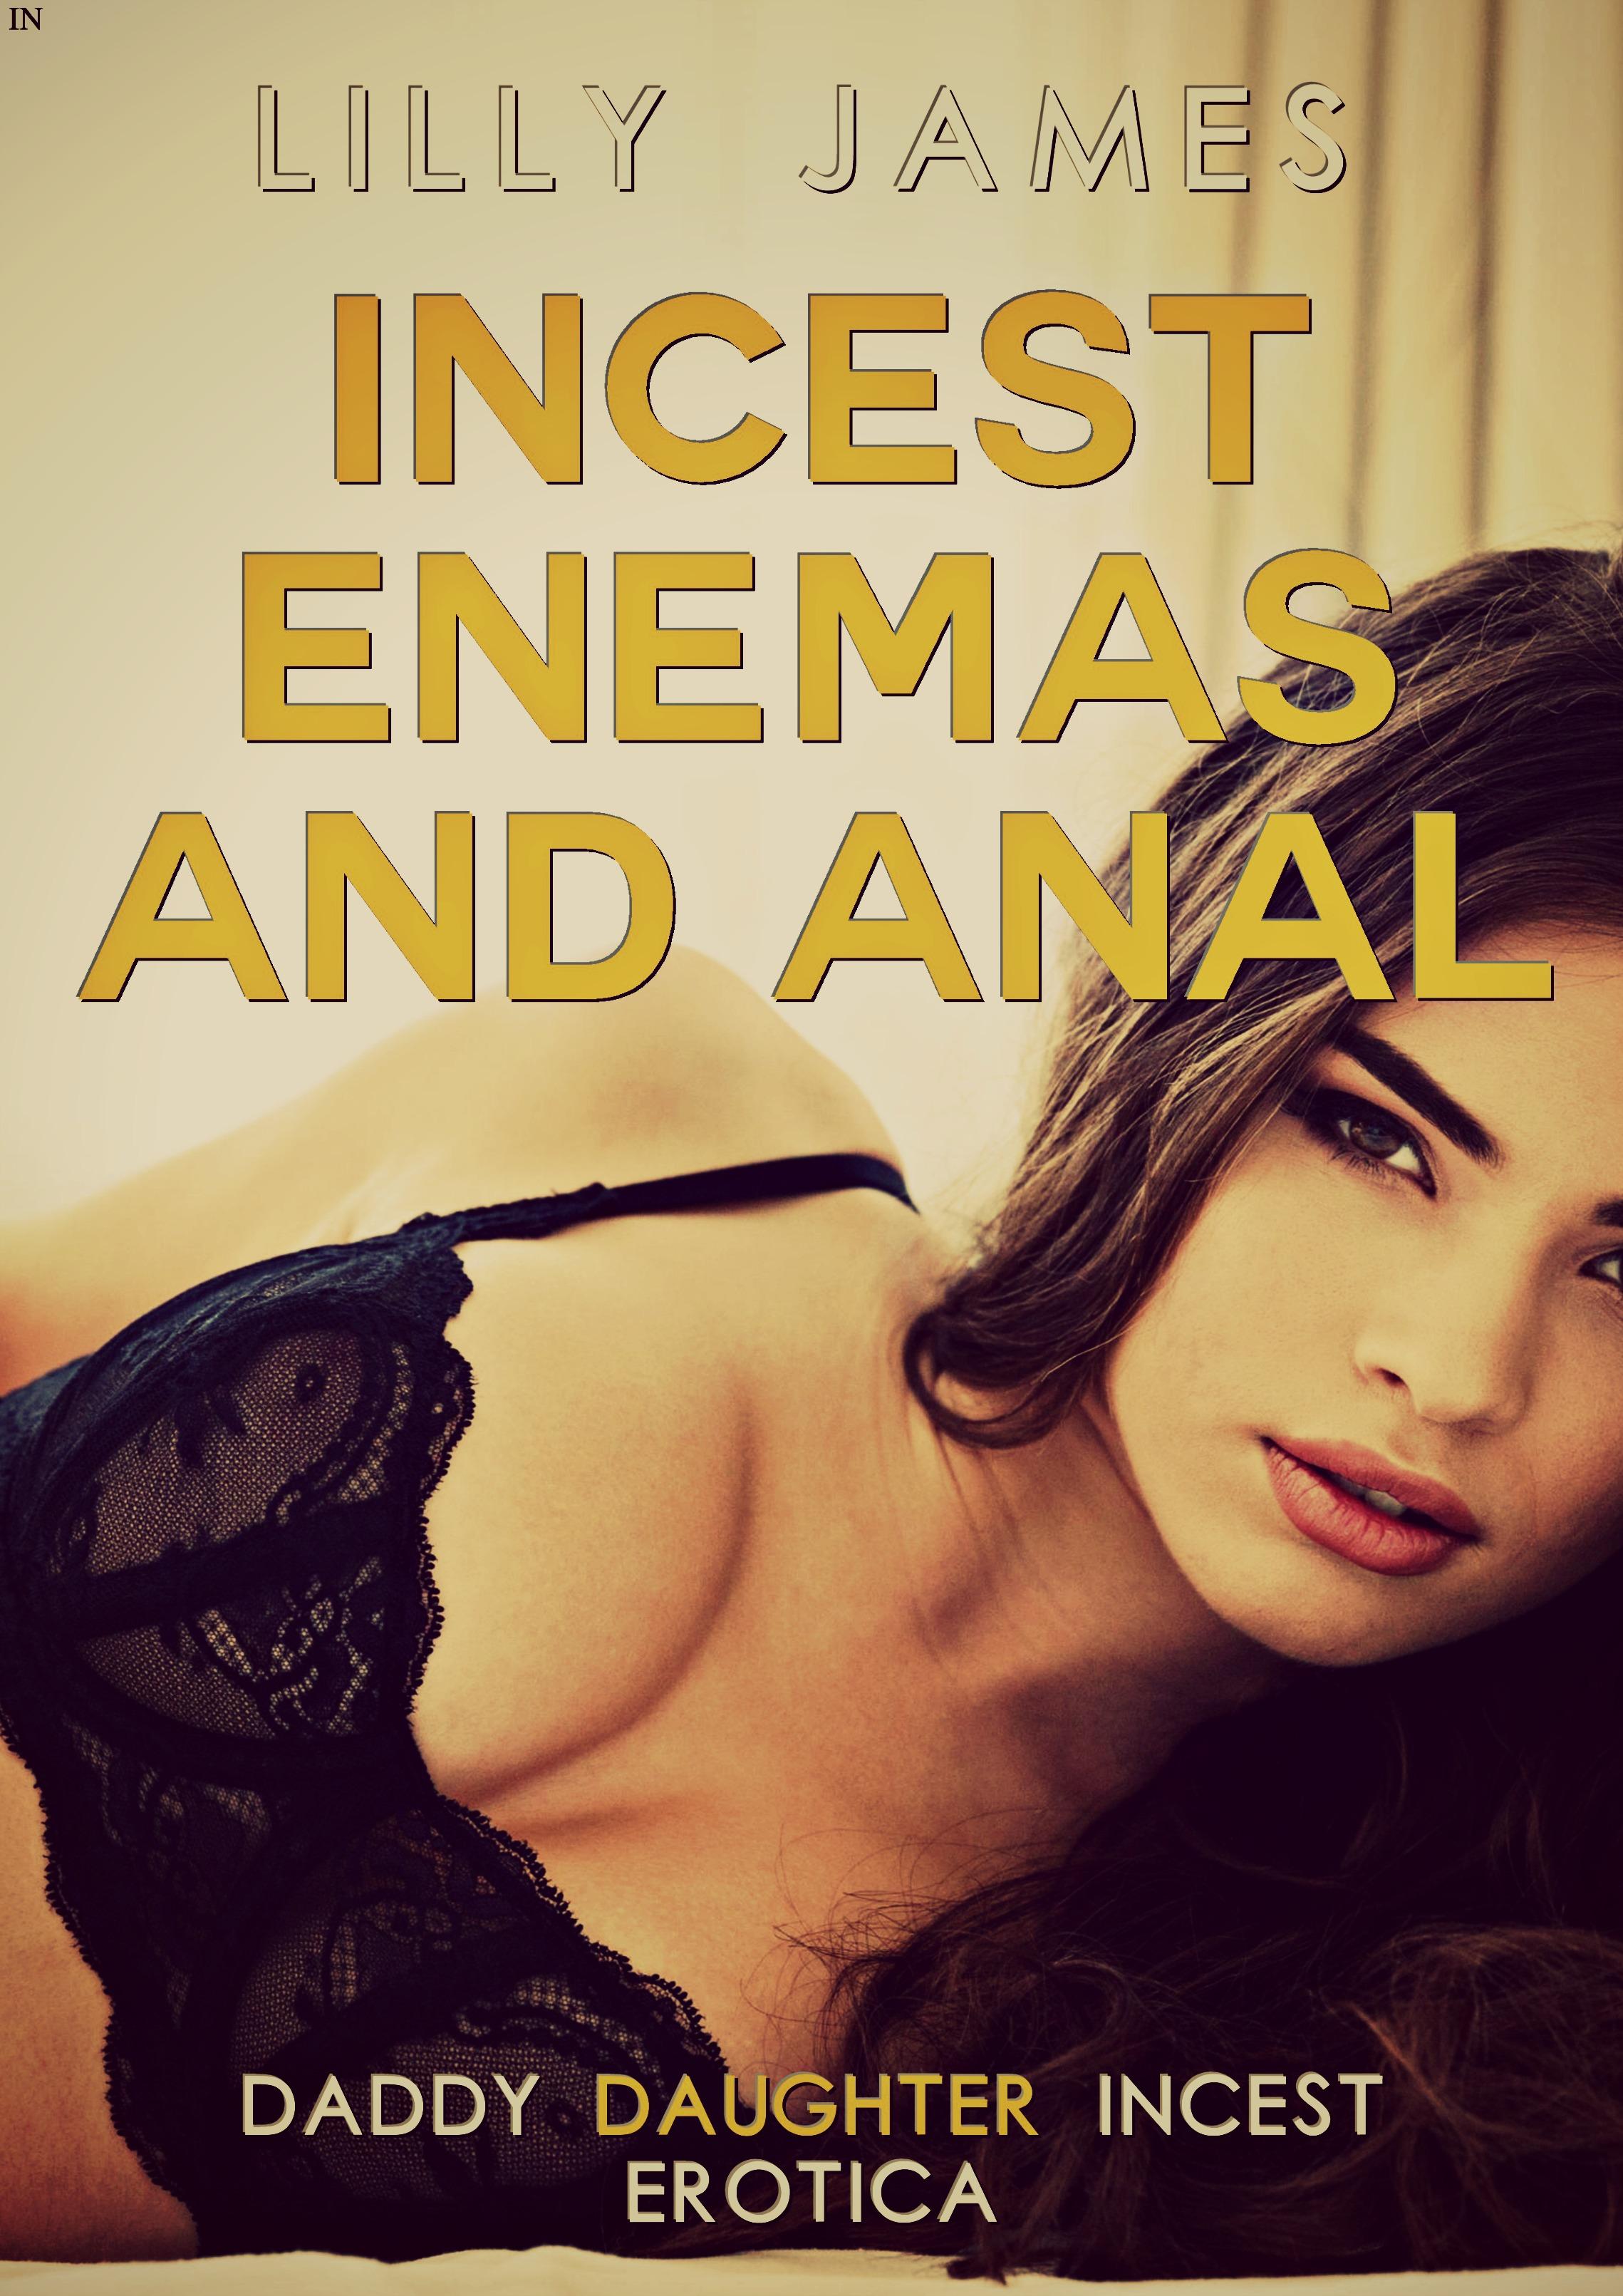 Incest, Enemas and Anal